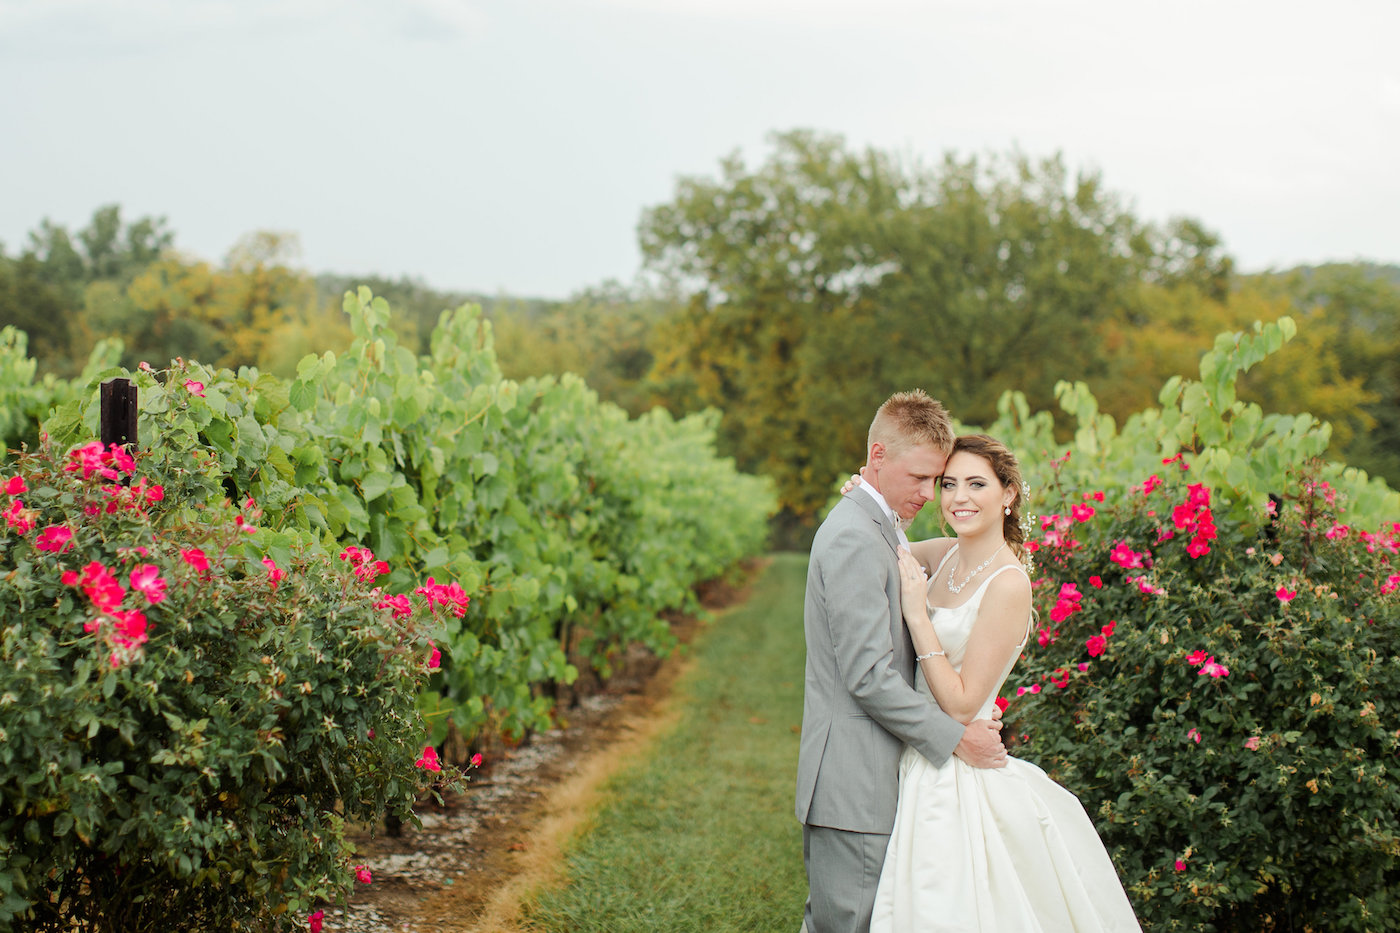 Morgan Justin S Rustic Country Wedding Missouri Rustic Weddings